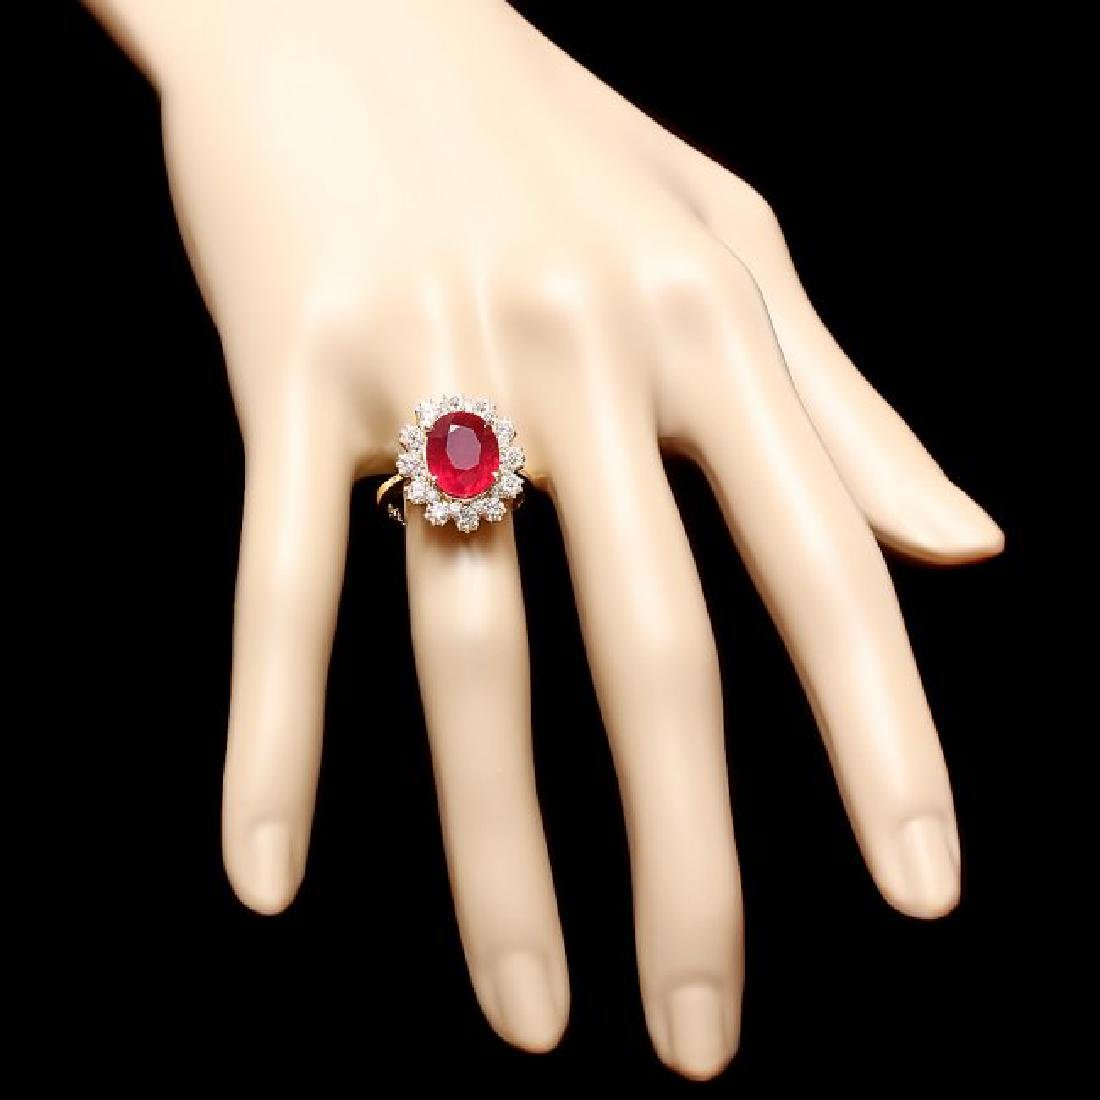 14k Yellow Gold 5.50ct Ruby 1.30ct Diamond Ring - 4